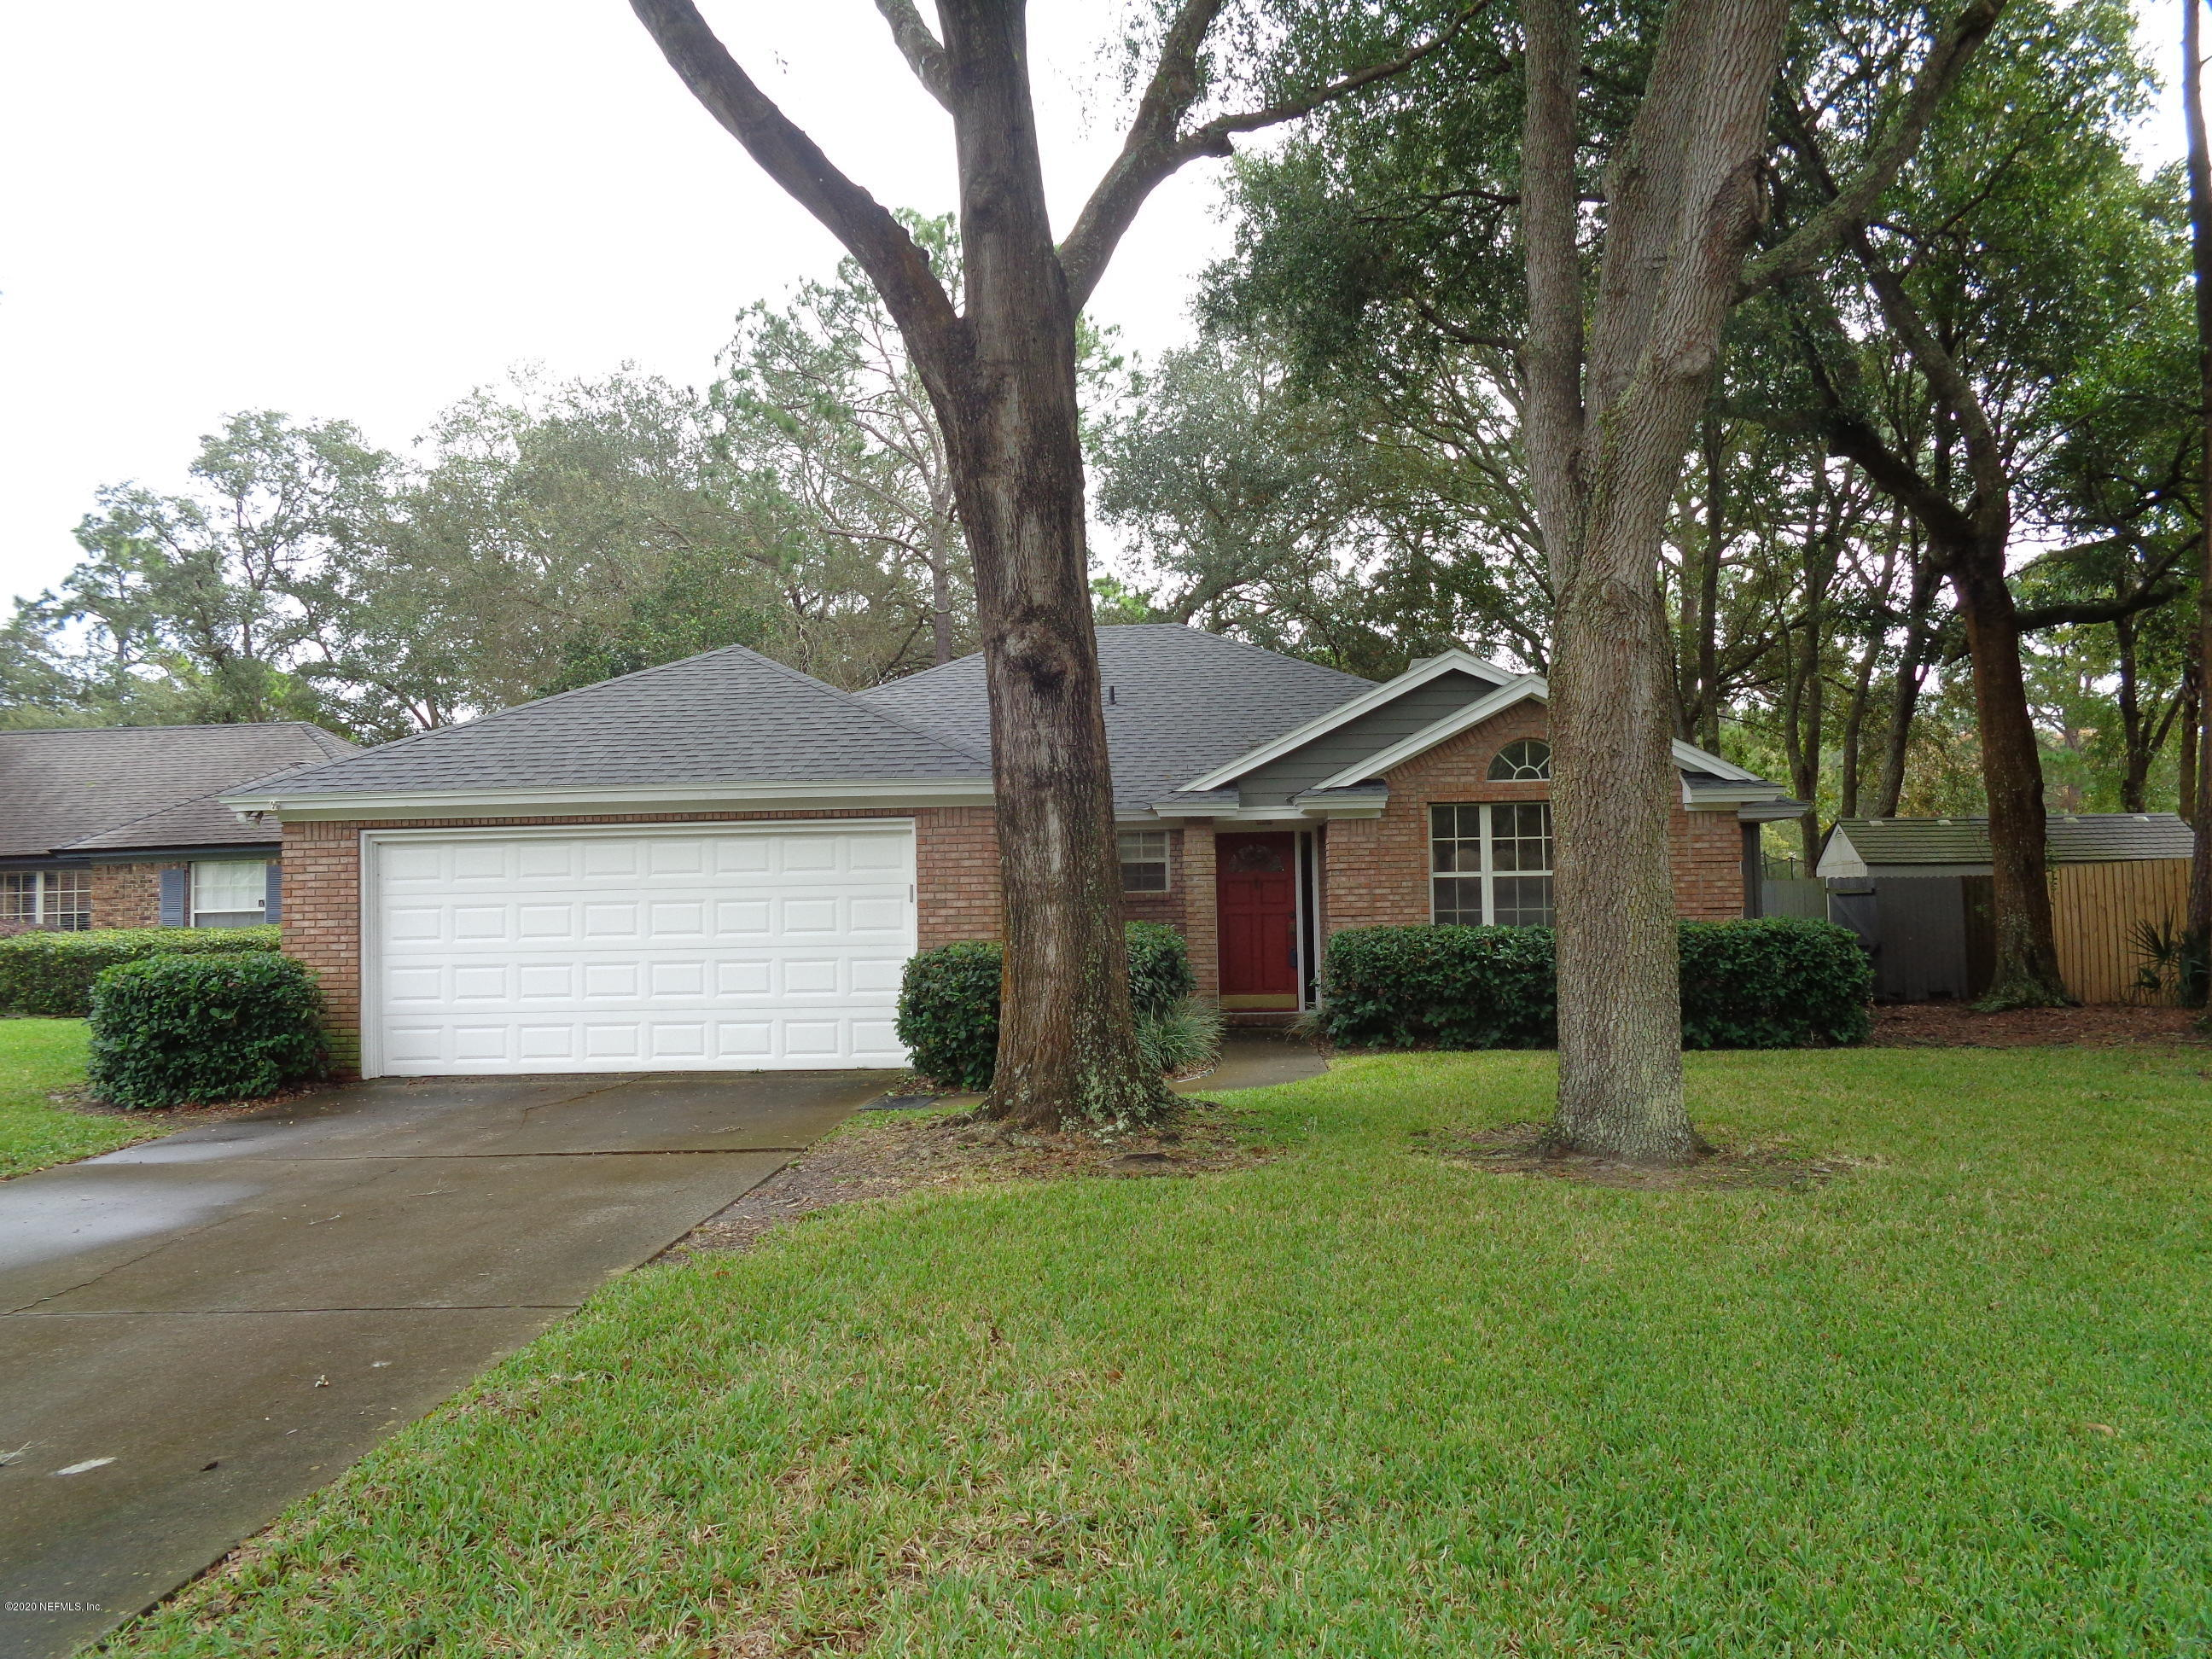 1717 SWIMMING SALMON, JACKSONVILLE, FLORIDA 32225, 3 Bedrooms Bedrooms, ,2 BathroomsBathrooms,Rental,For Rent,SWIMMING SALMON,1082155